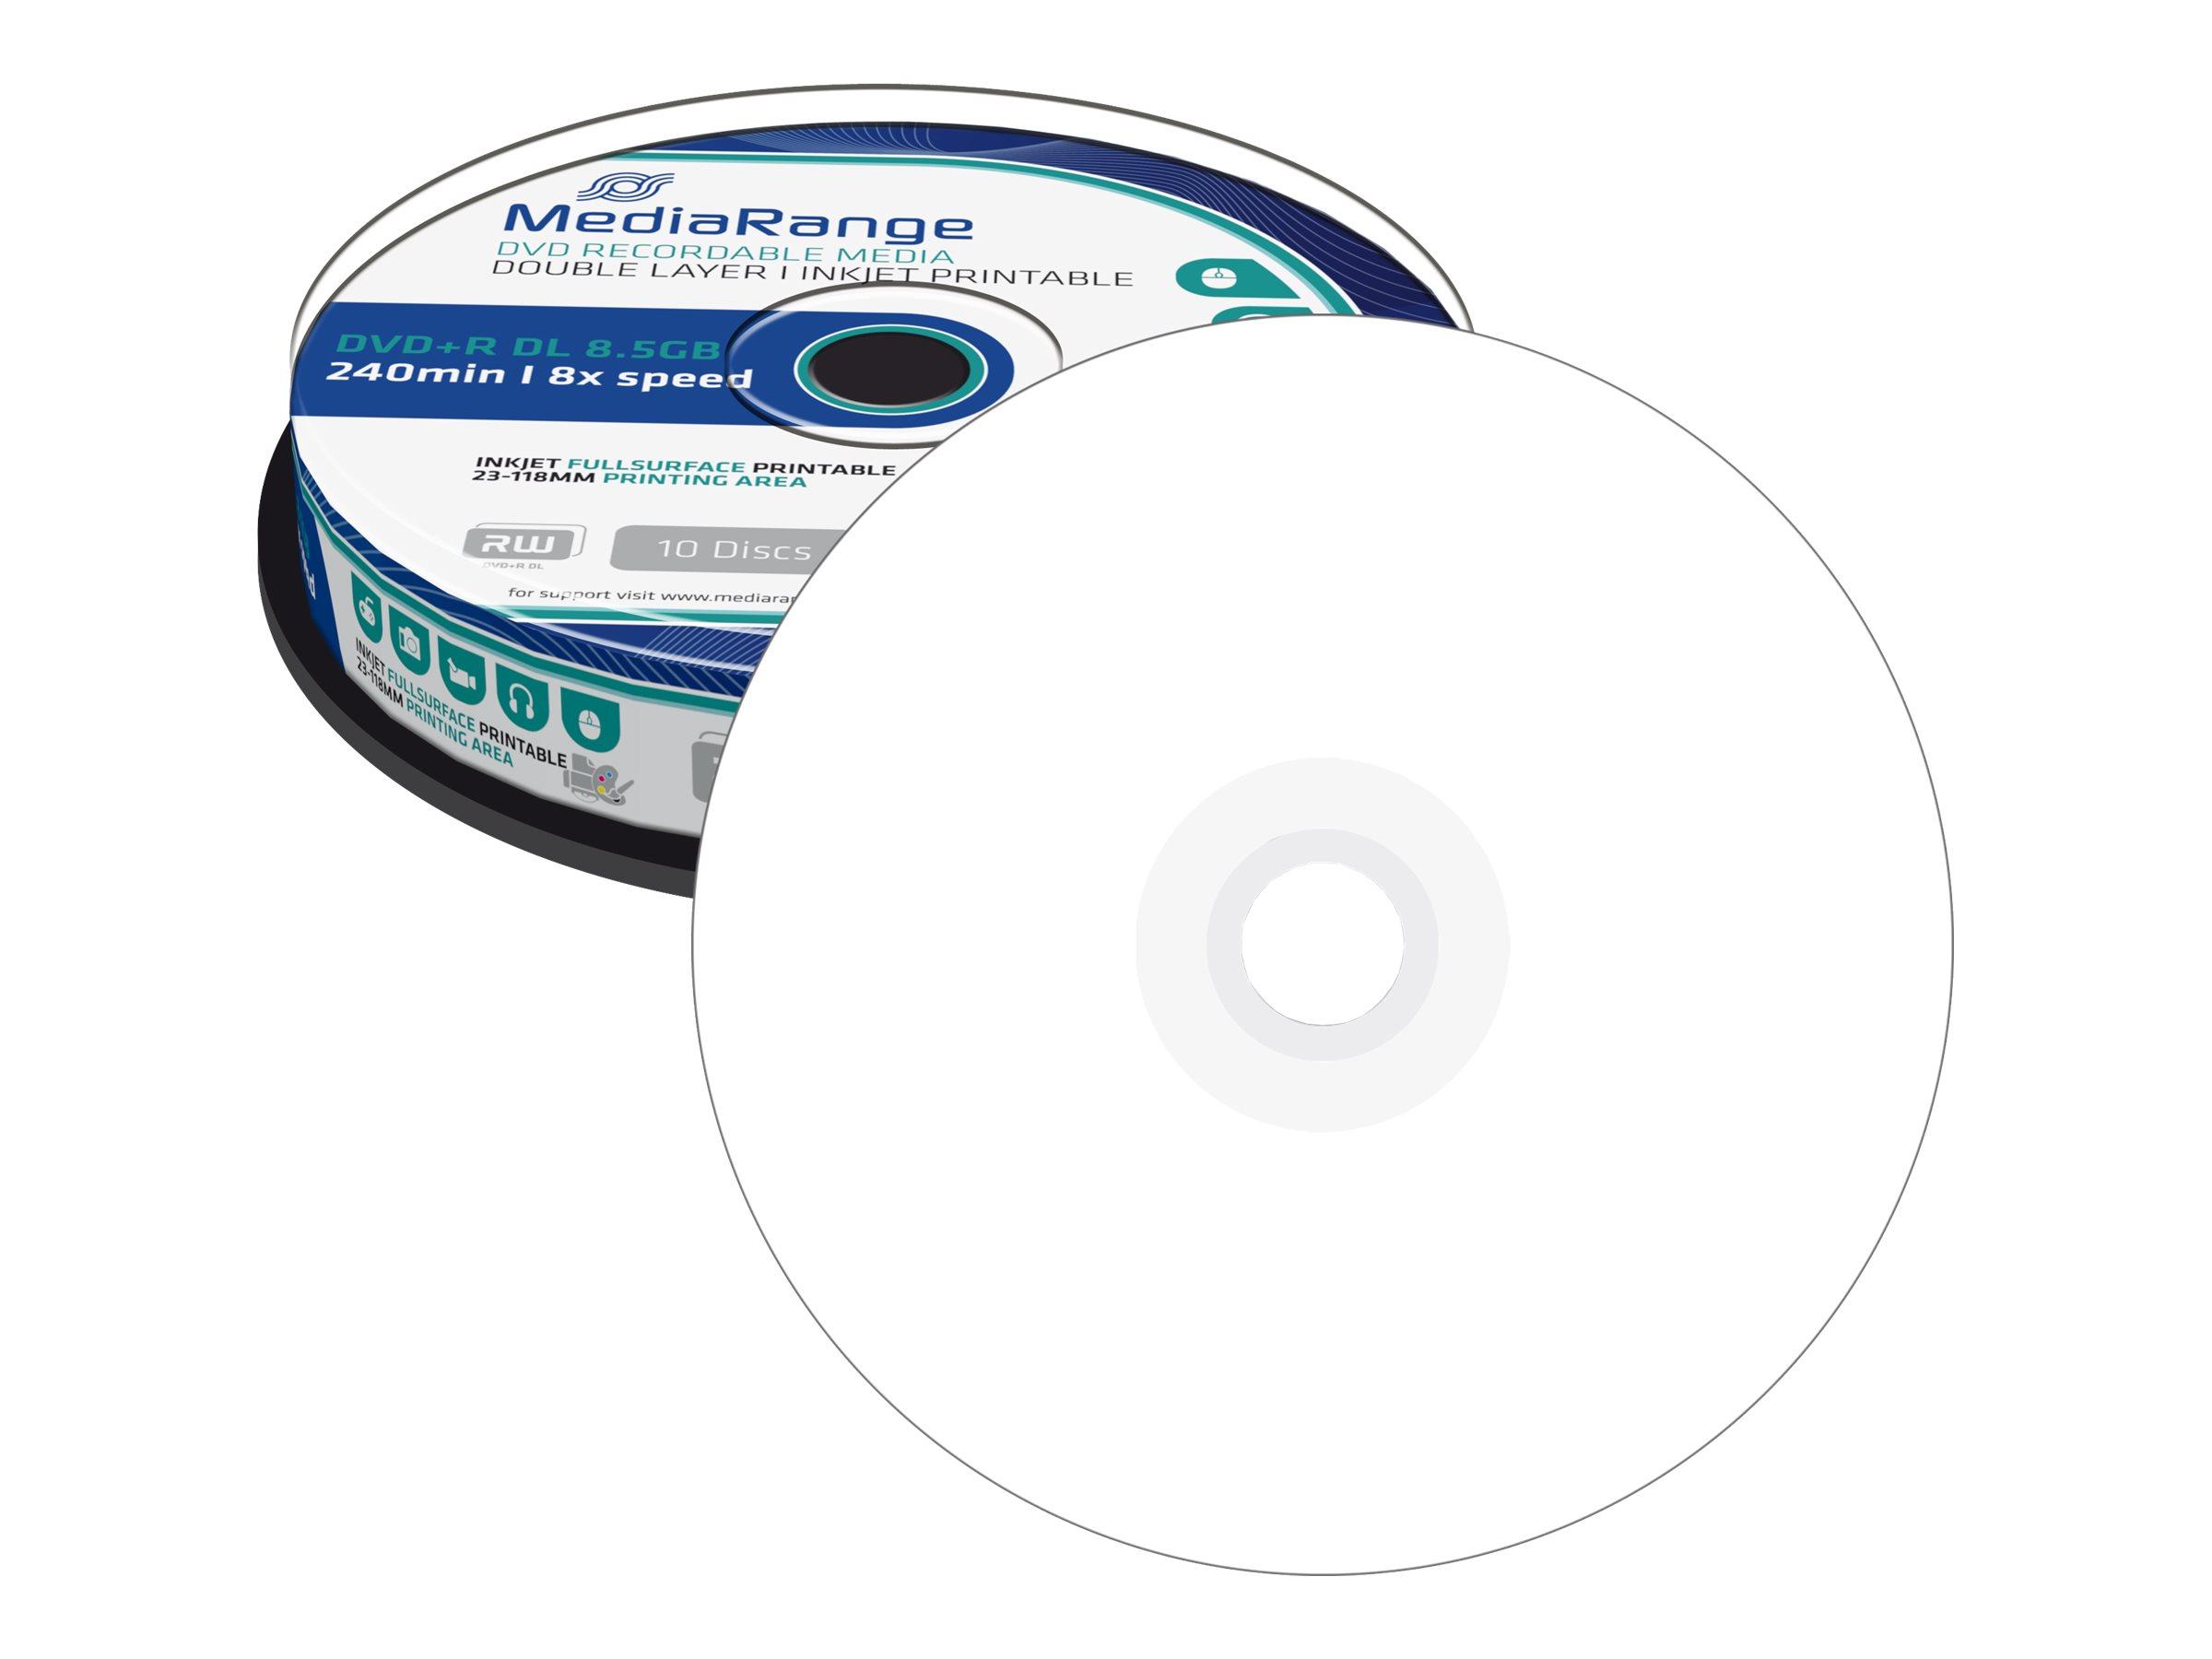 MEDIARANGE 10 x DVD+R DL - 8.5 GB (240 Min.) 8x